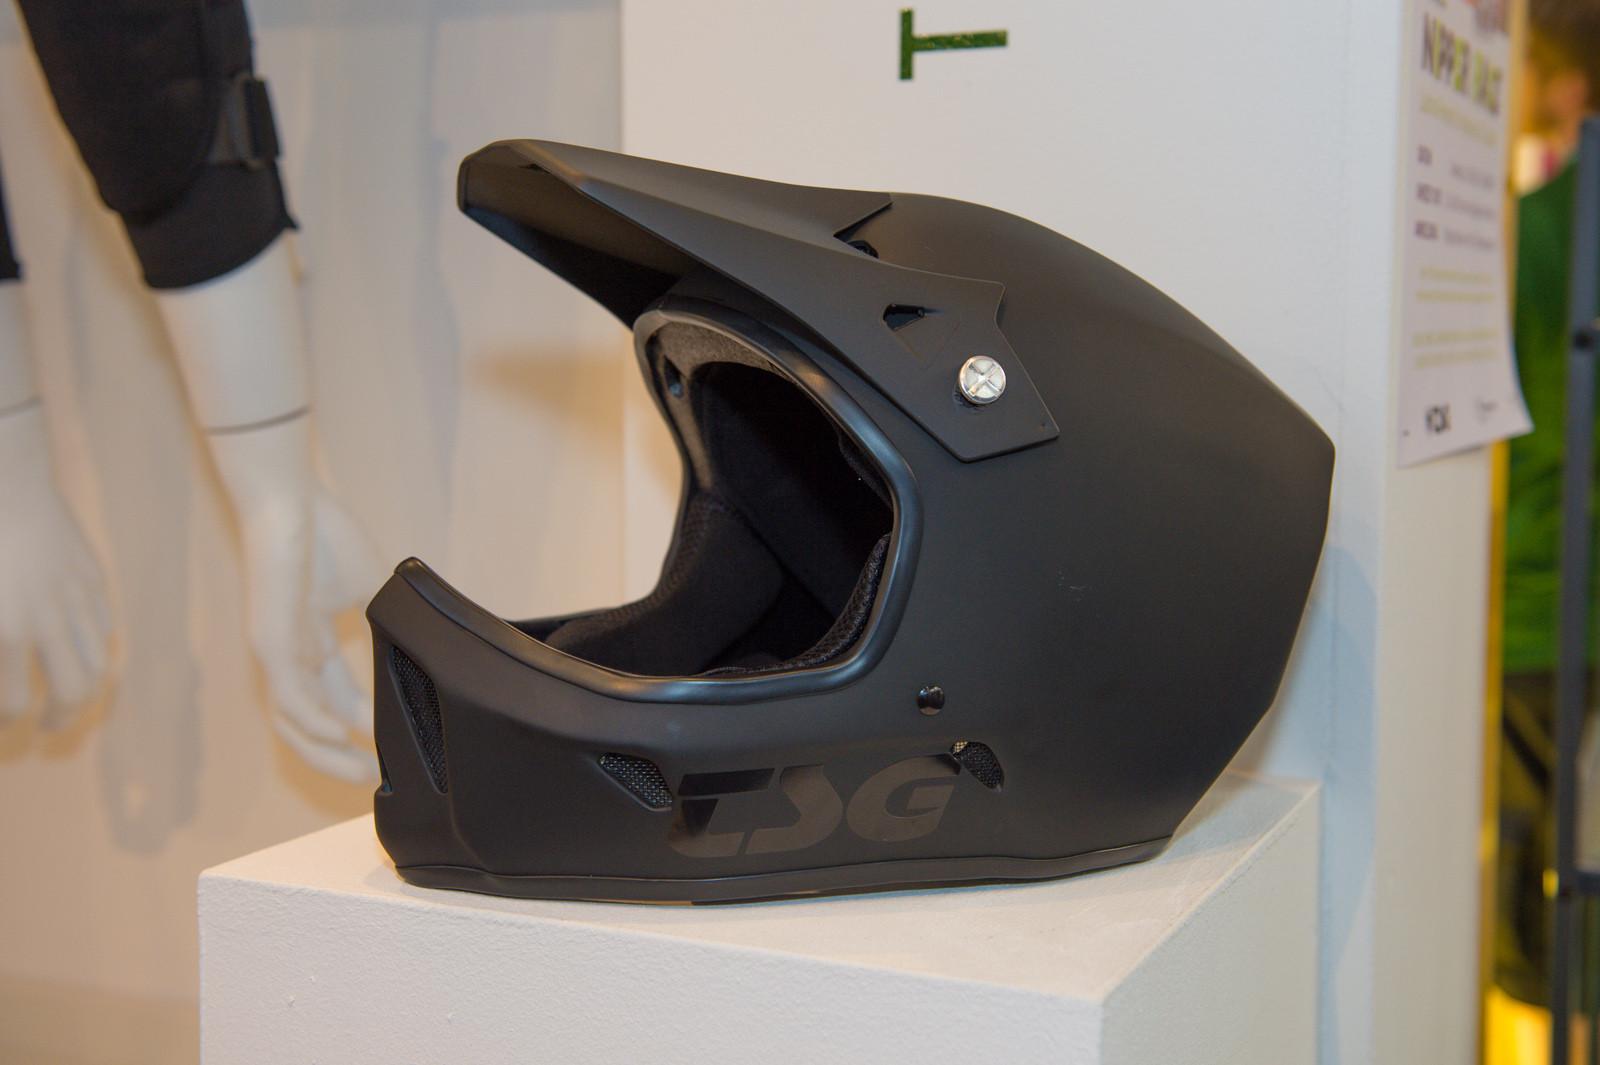 TSG Advance Composite Full-Face Helmet - 2014 Mountain Bike Apparel & Protection at Eurobike 2013 - Mountain Biking Pictures - Vital MTB